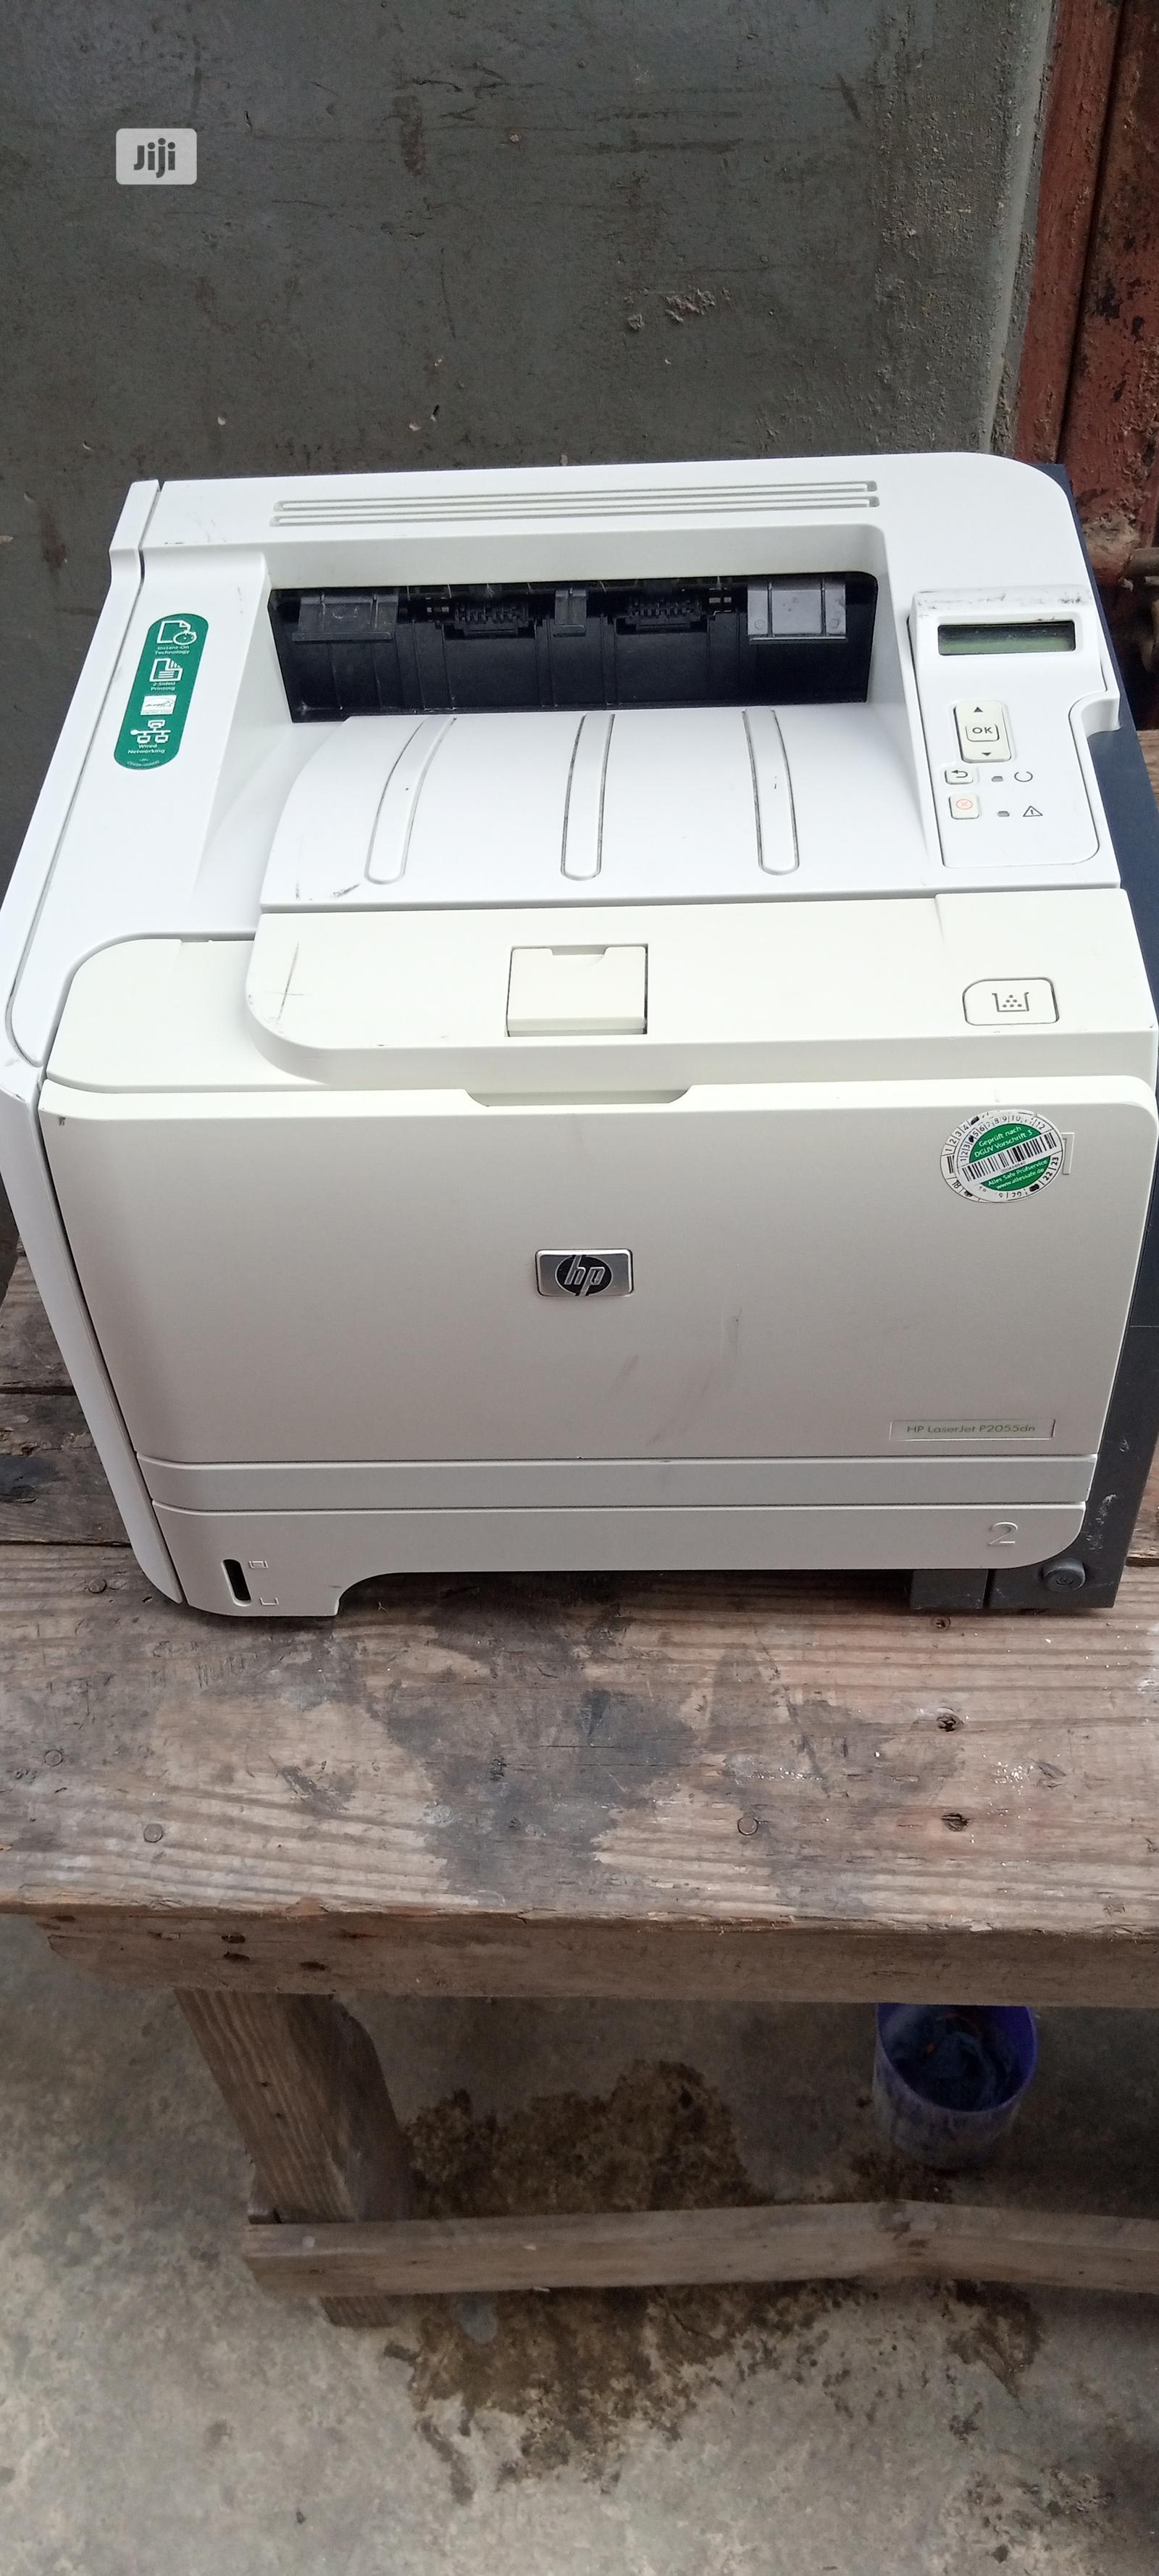 HP Laserjet P2055 Printer Black And White